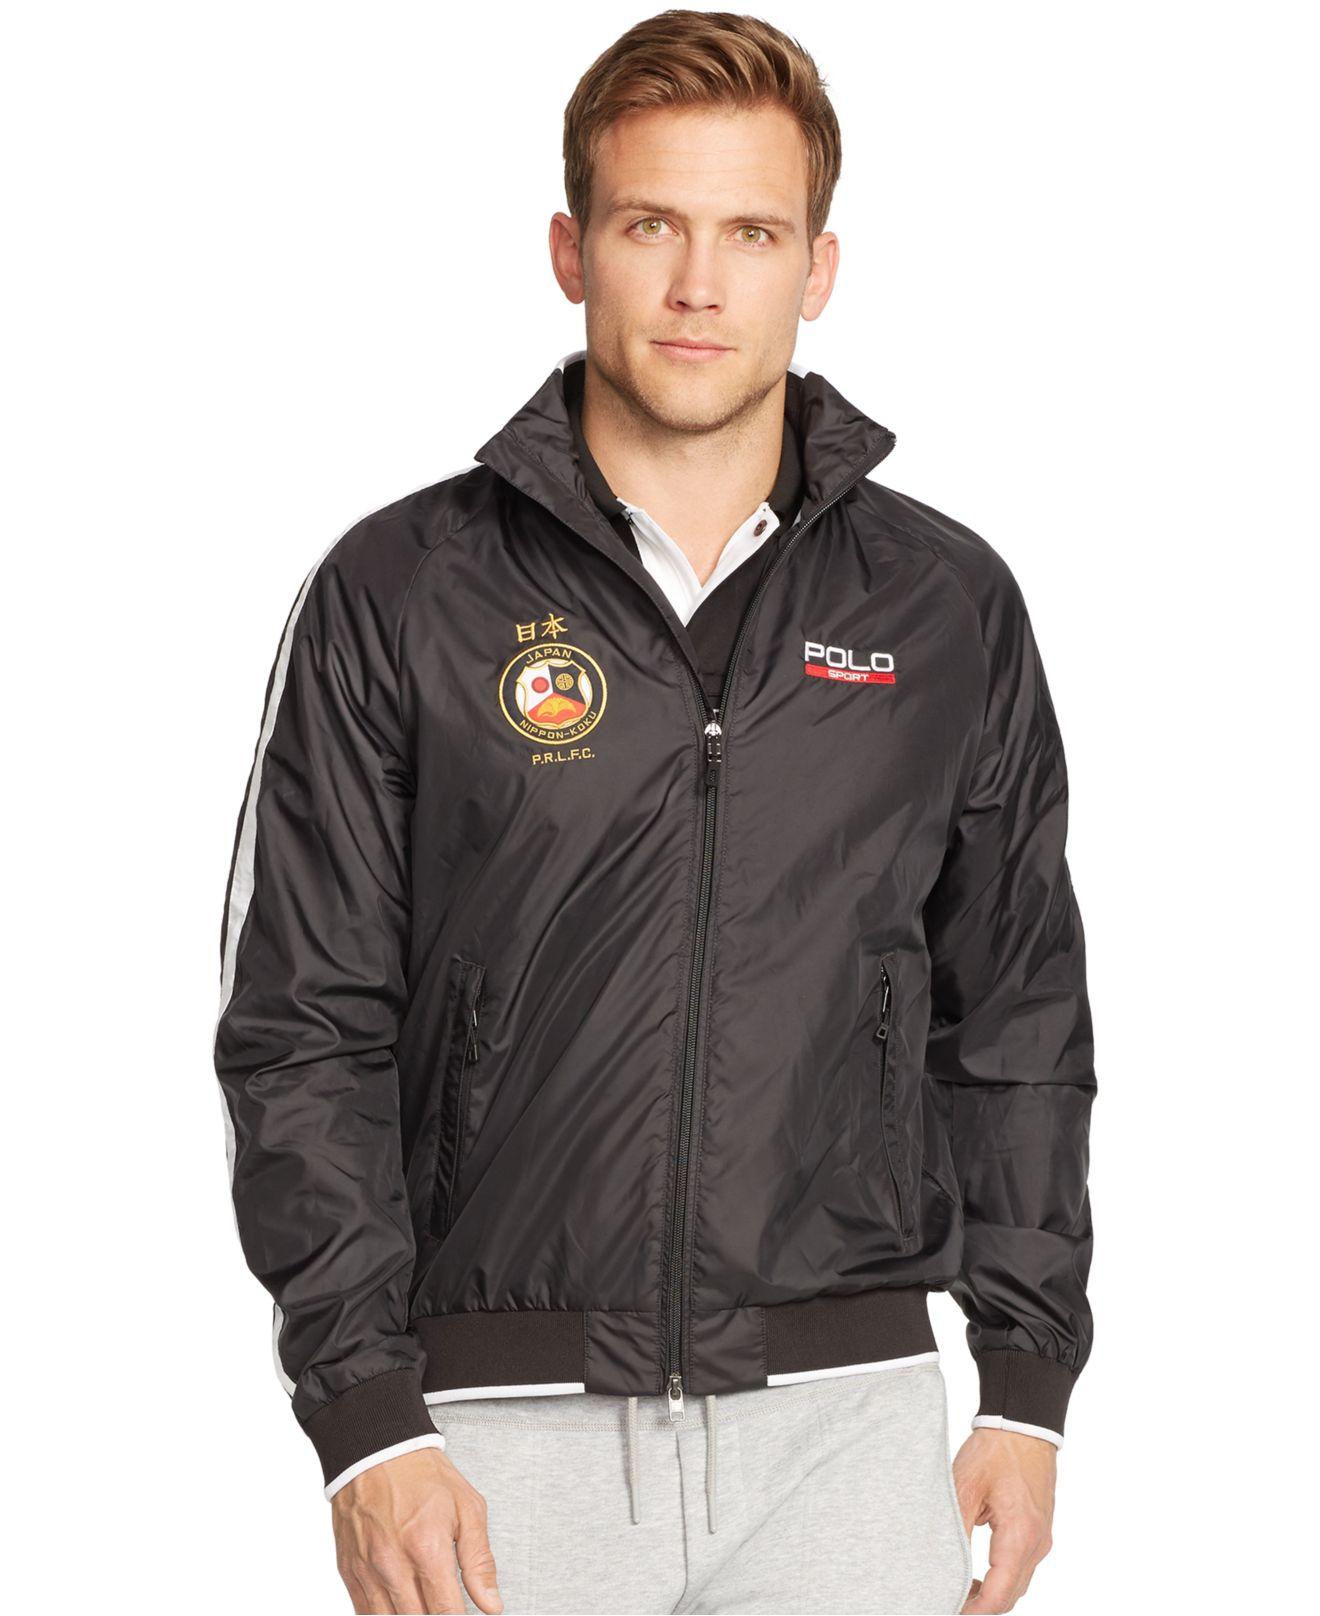 polo ralph lauren polo sport japan ripstop jacket in black for men. Black Bedroom Furniture Sets. Home Design Ideas